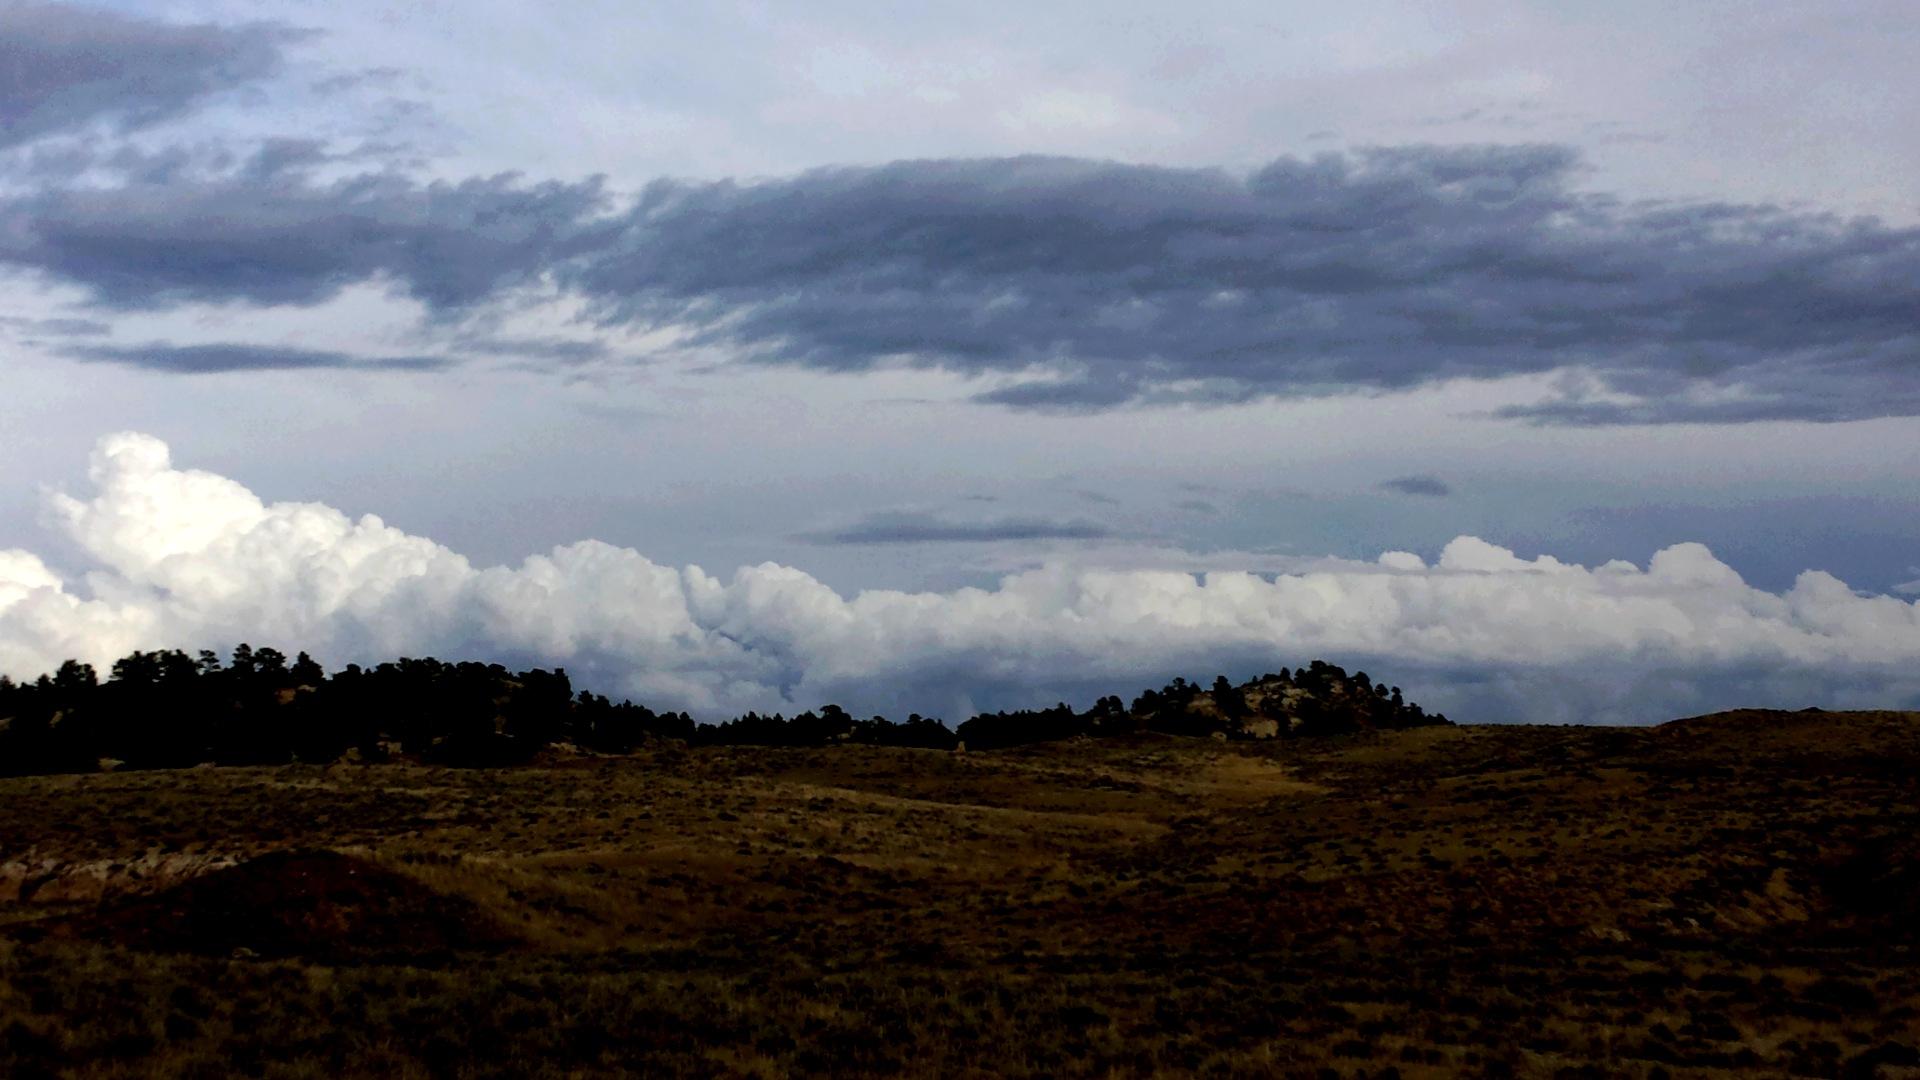 Storm Clouds by Carole Martinez